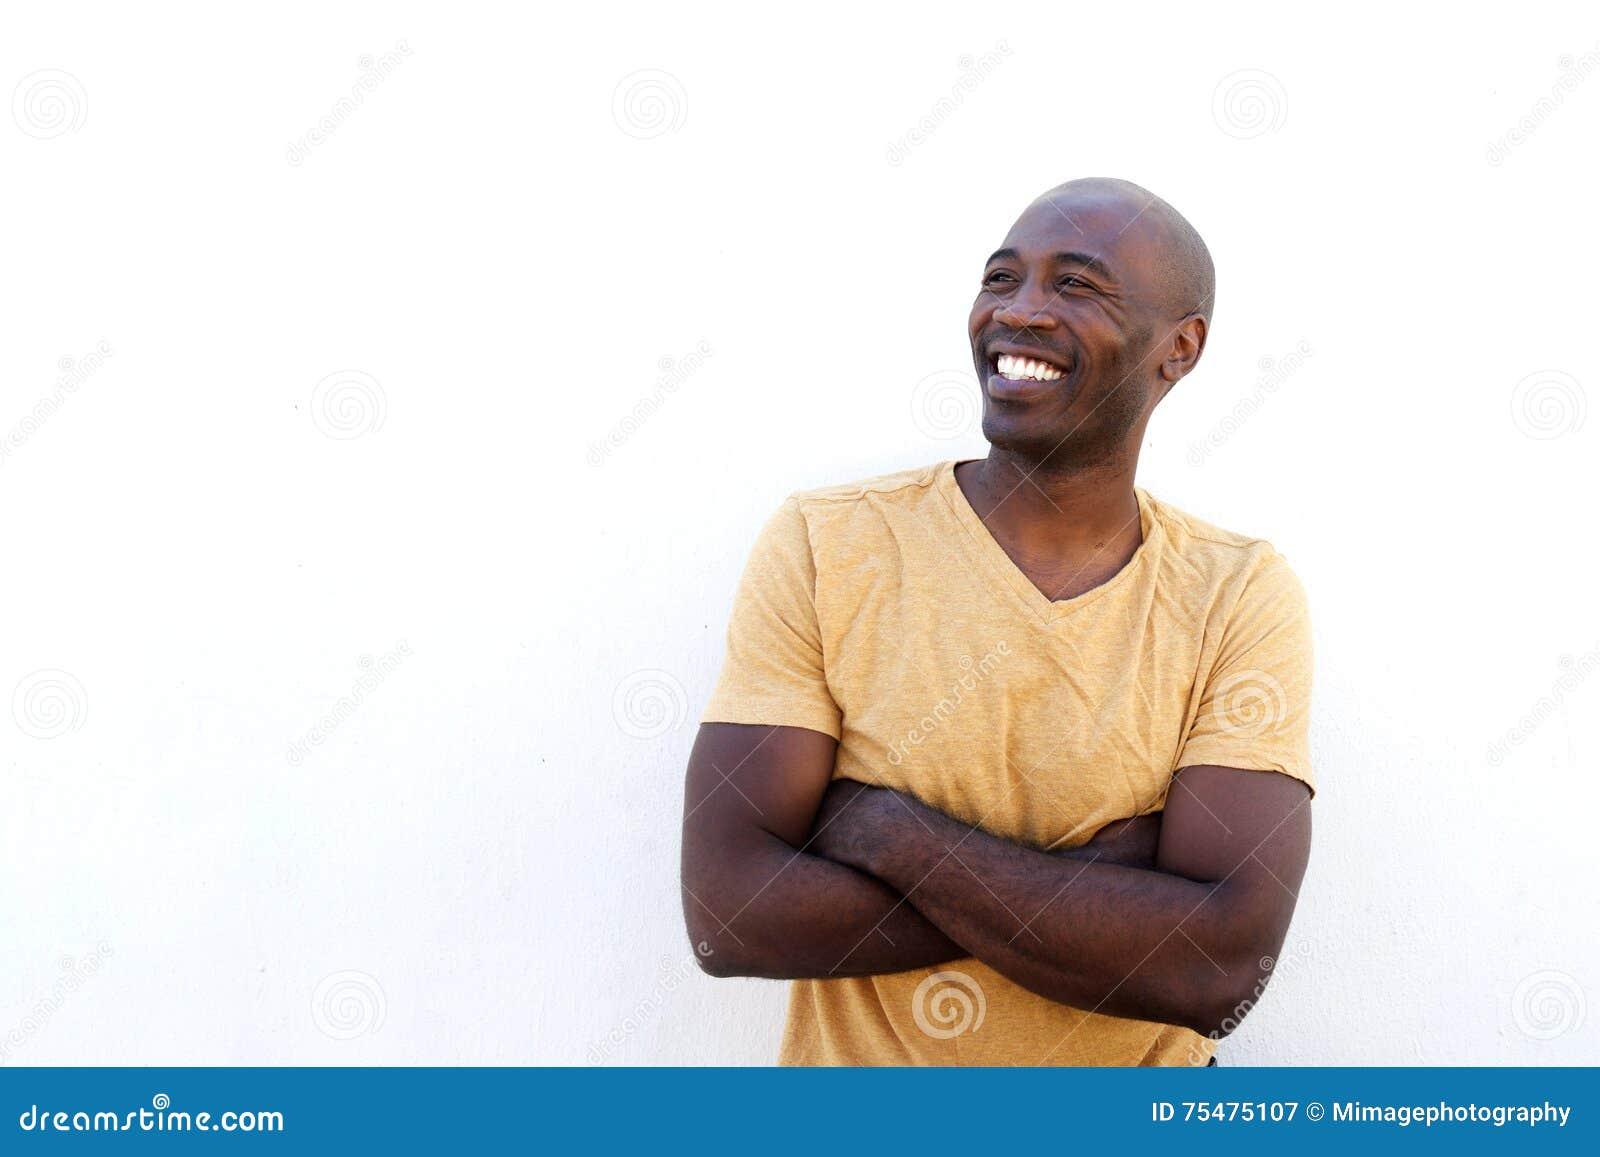 Modelo masculino afro-americano contra a parede branca